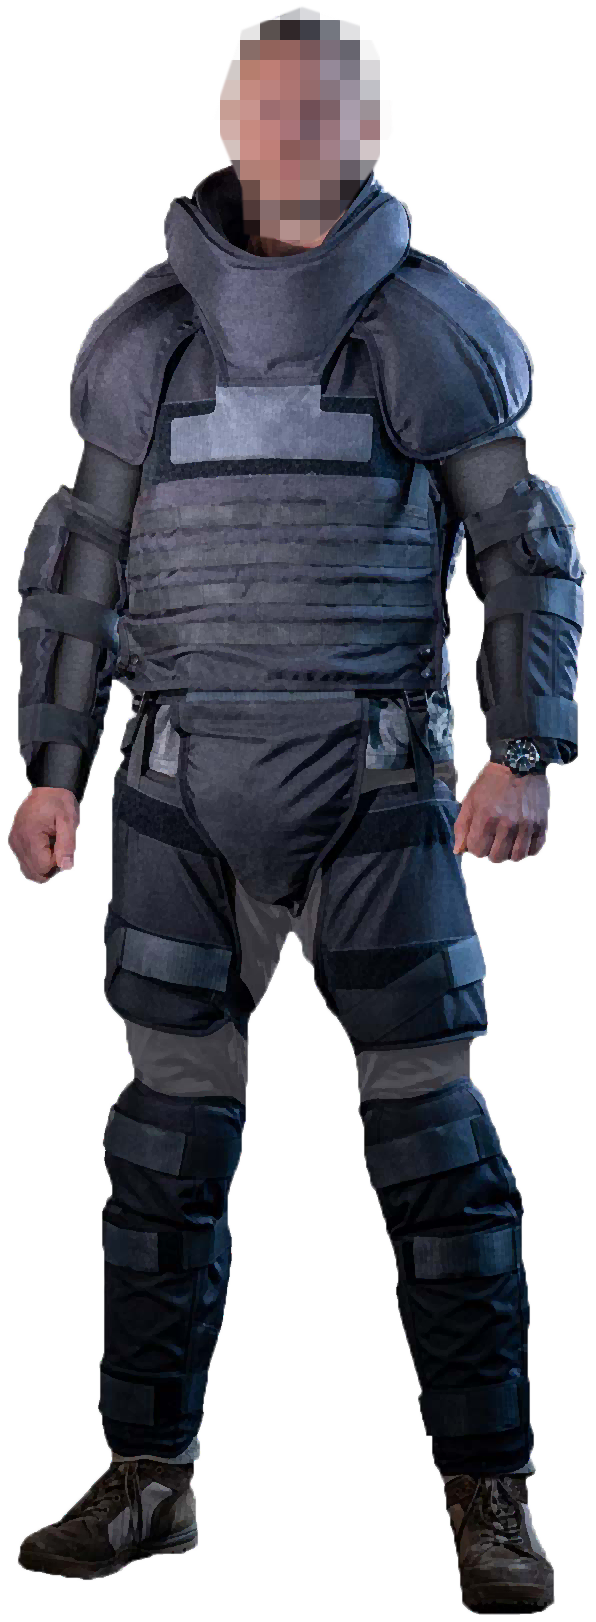 Stab Resistant Anti Riot Suit